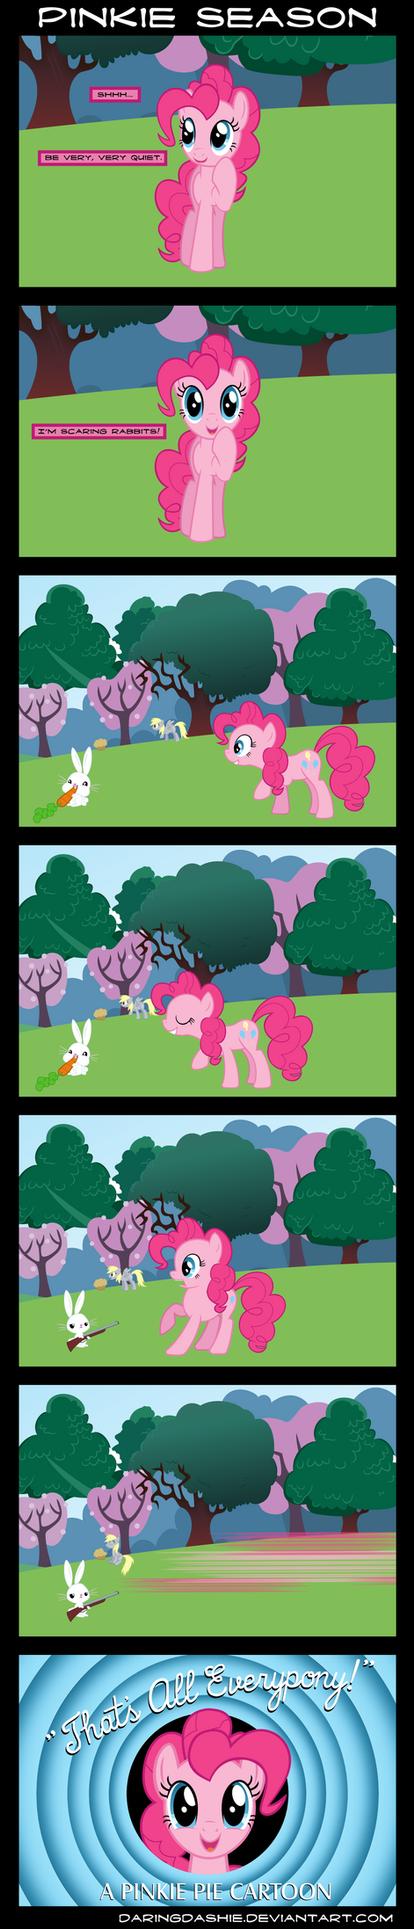 Comic - Pinkie Season by DaringDashie